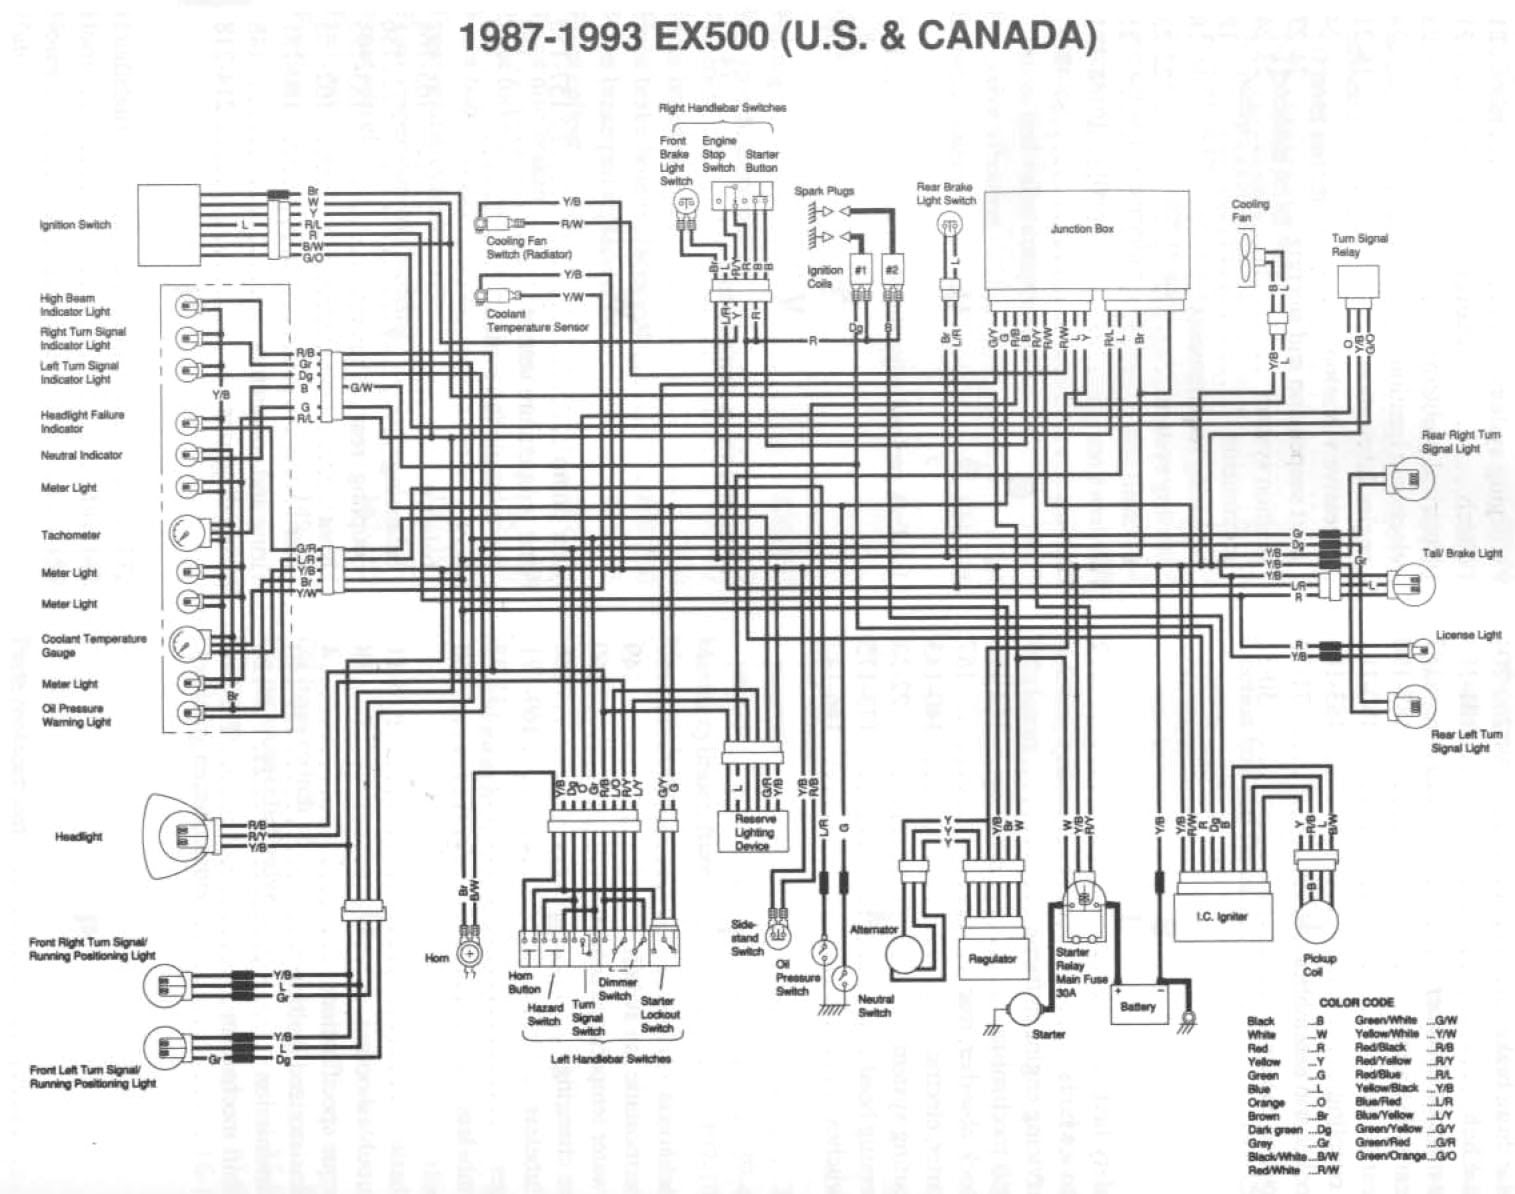 Diagram 1993 Kawasaki Ninja Ex500 Wiring Diagram Full Version Hd Quality Wiring Diagram Xlcdwir012 Fanfaradilegnano It